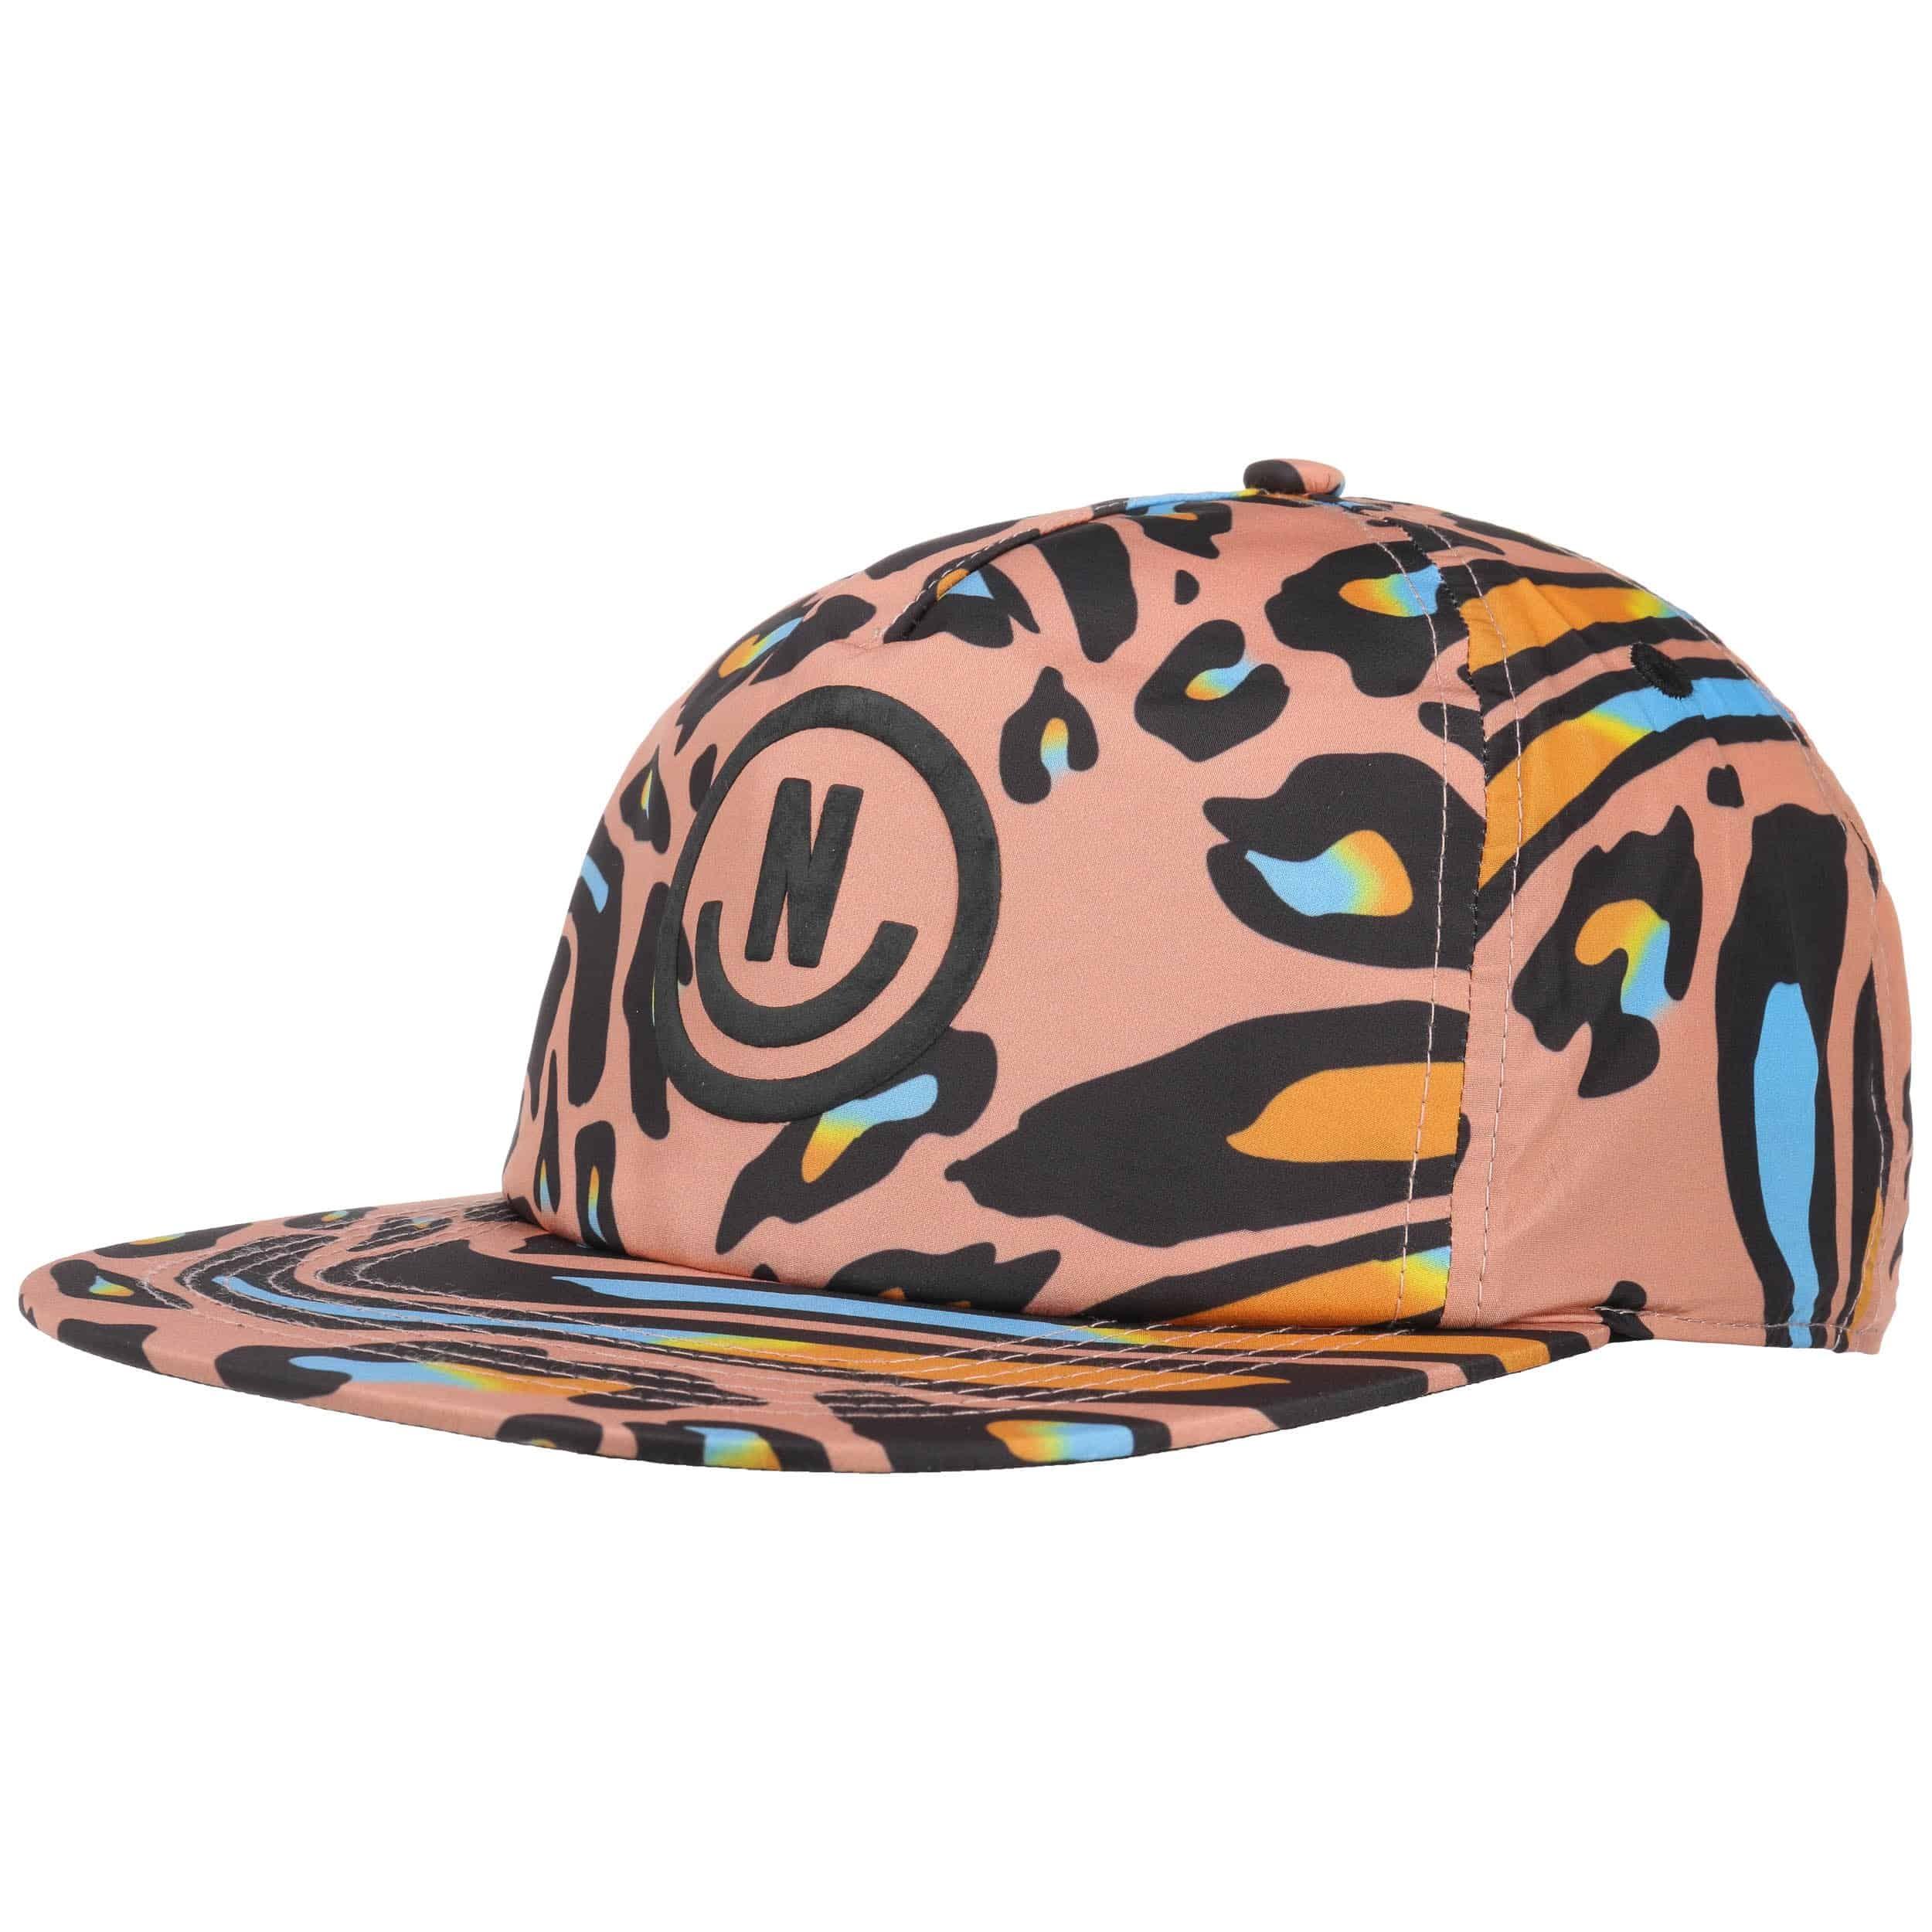 jungle snapback cap by neff eur 24 95 hats caps beanies shop online. Black Bedroom Furniture Sets. Home Design Ideas